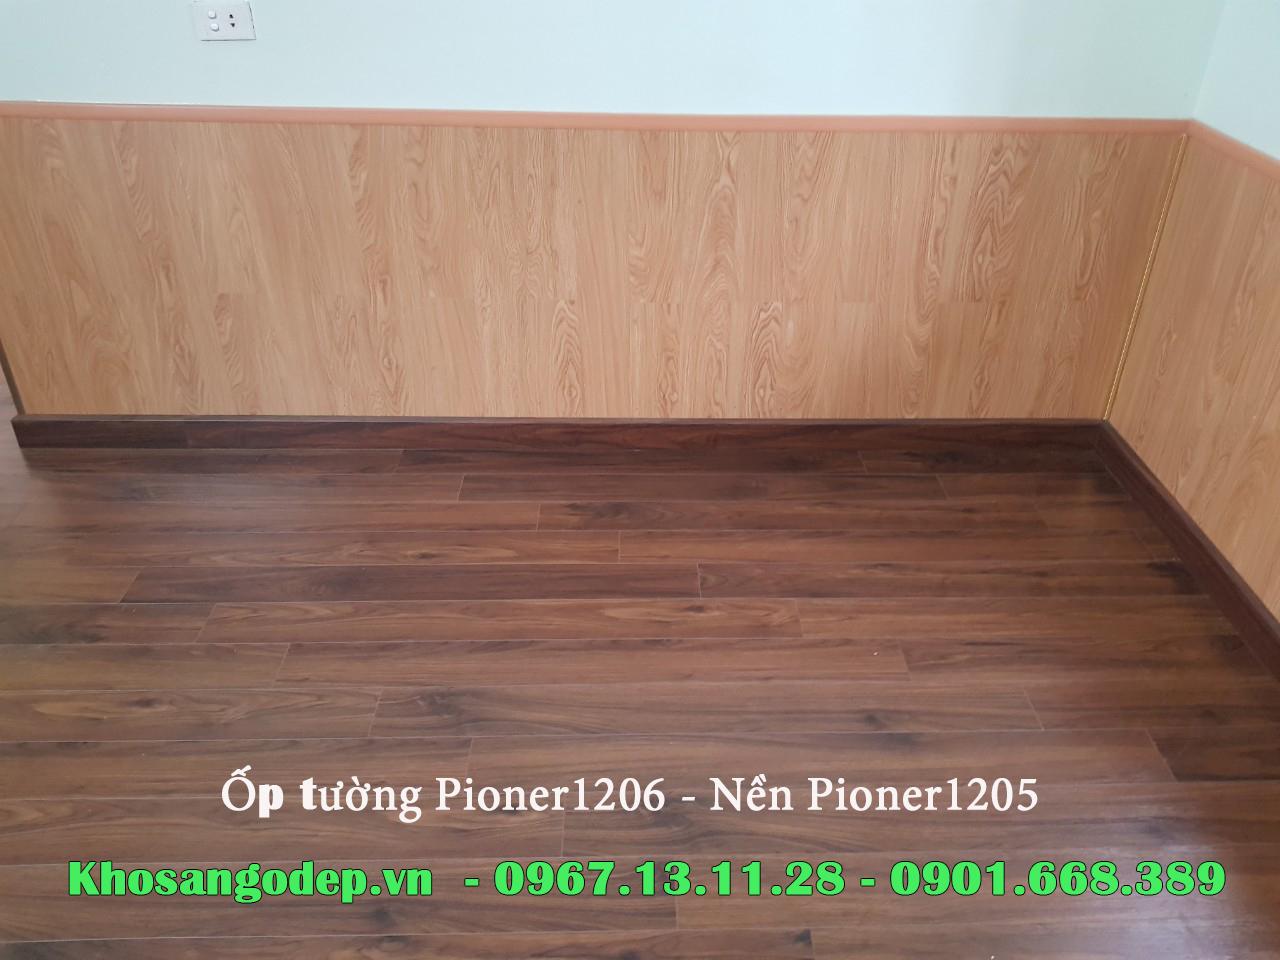 Sàn gỗ Pioner 1206